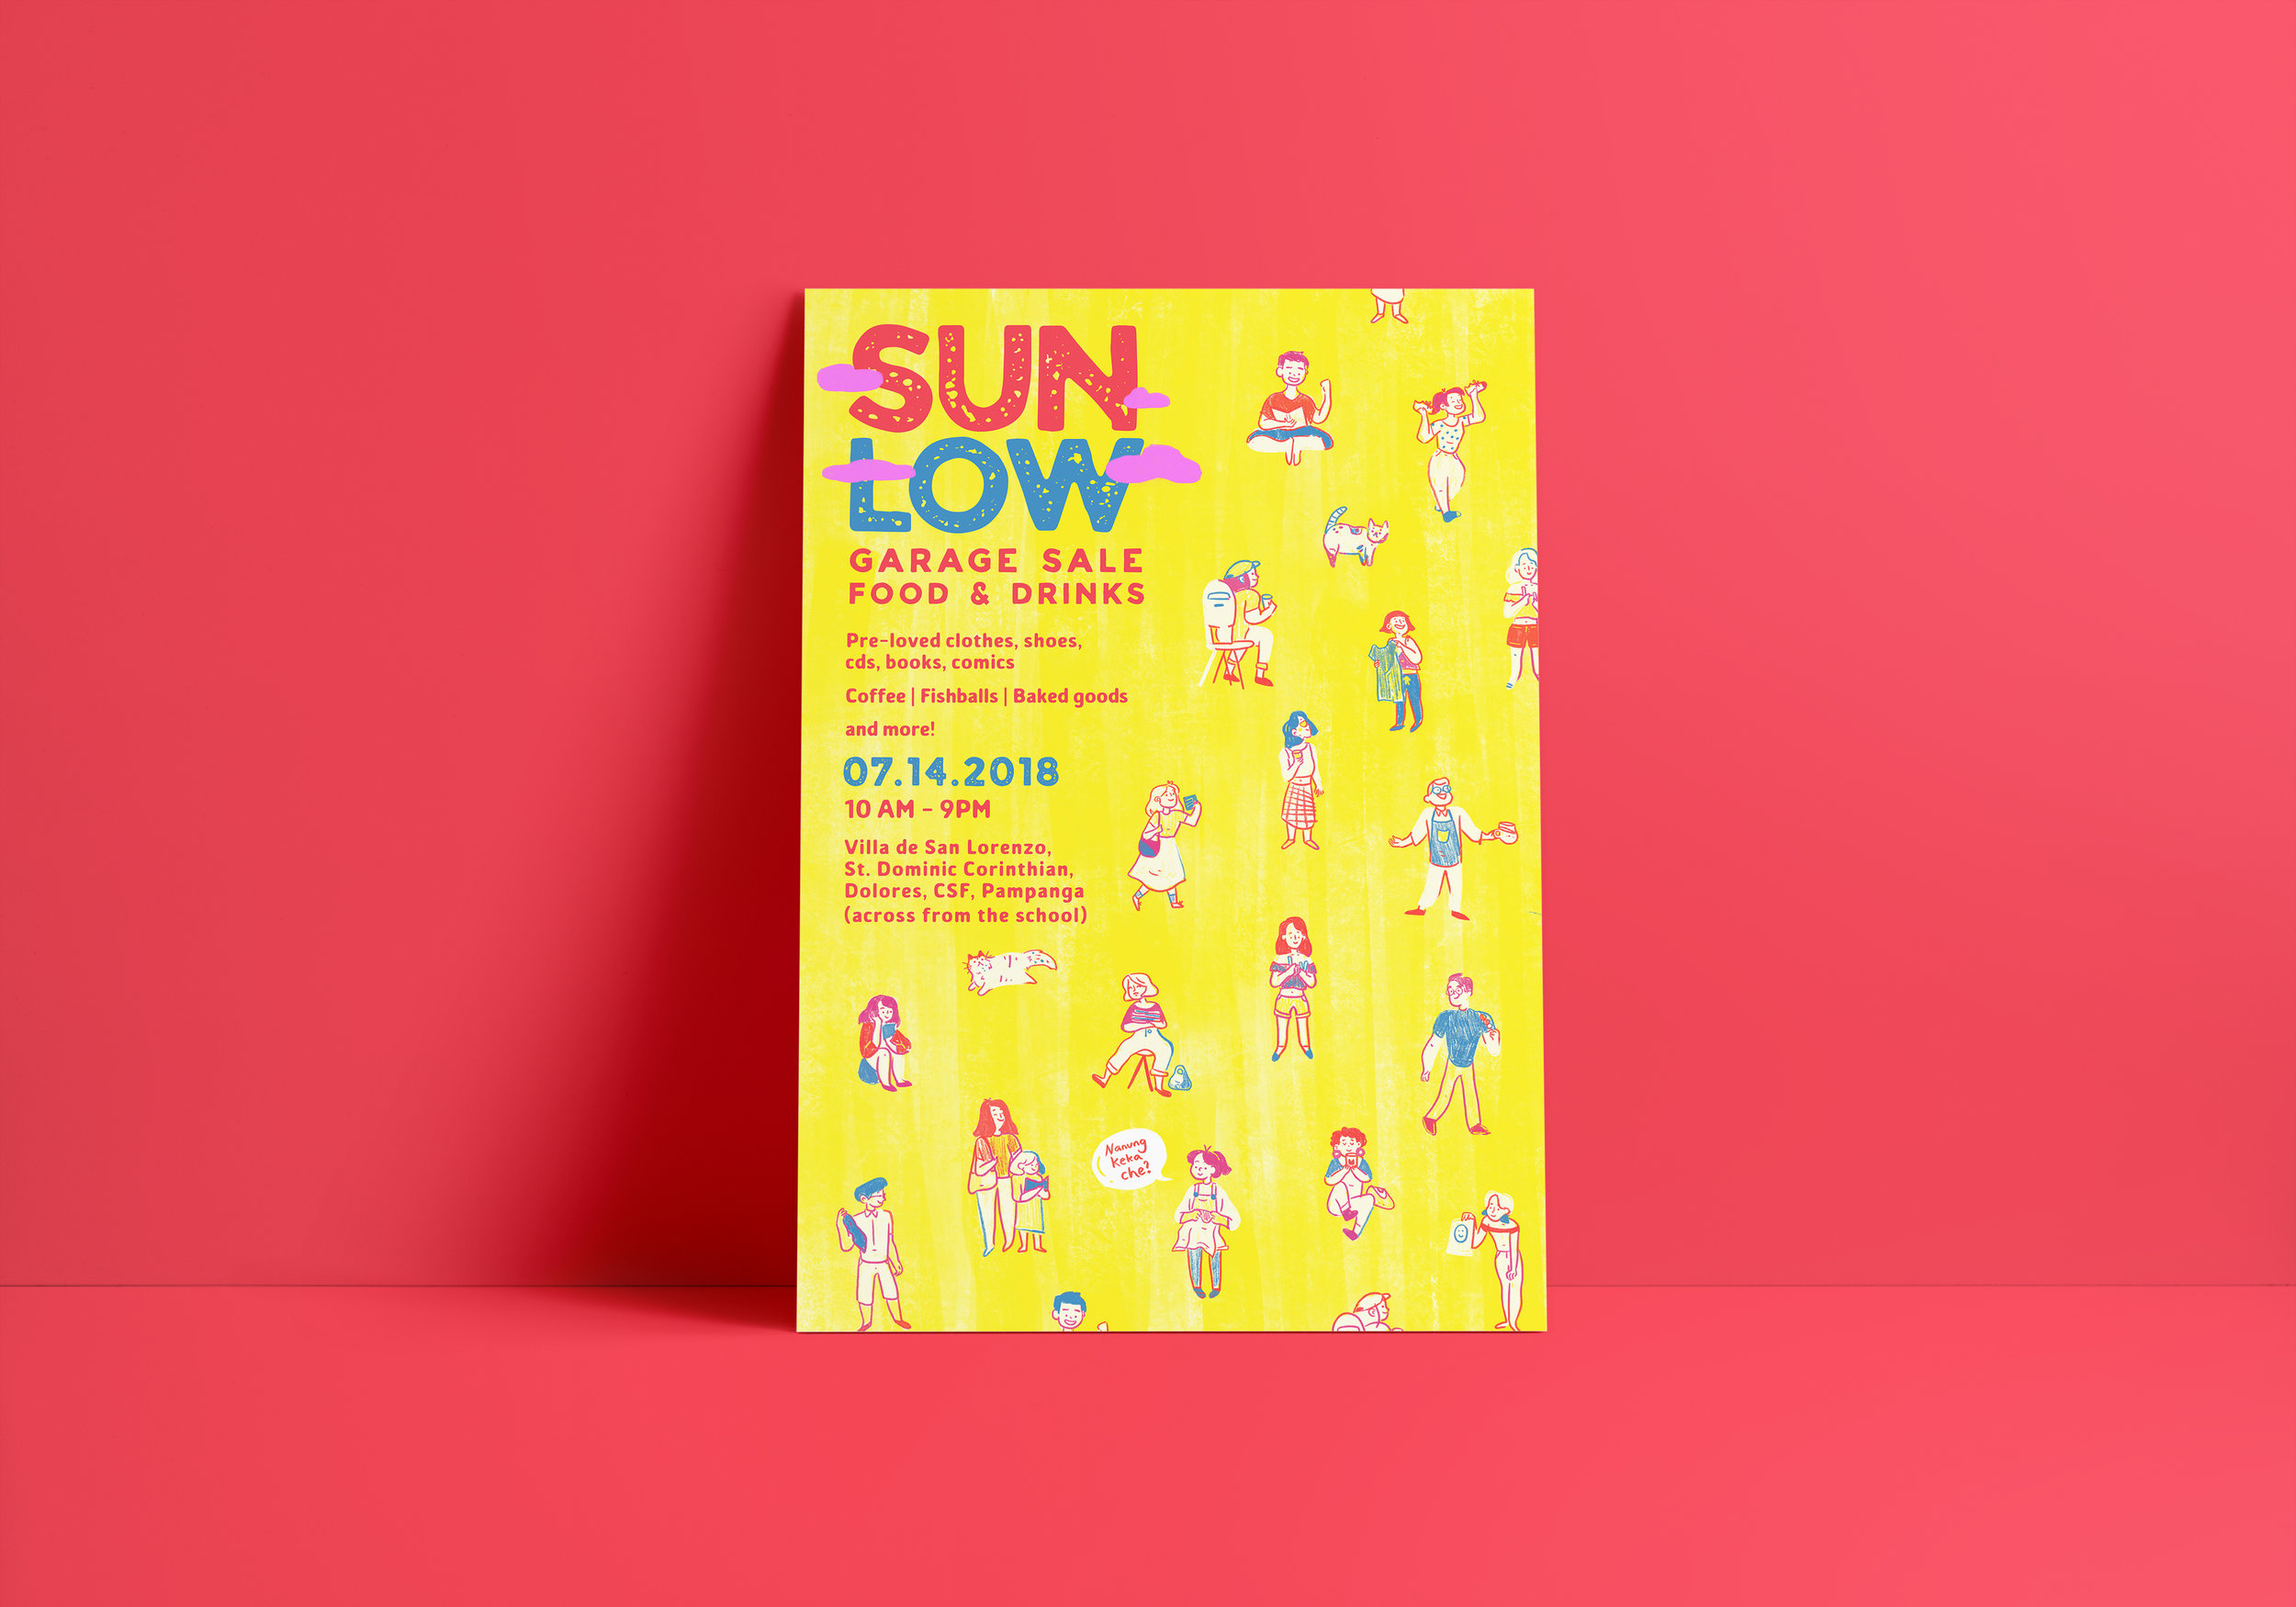 sunlow2.jpg